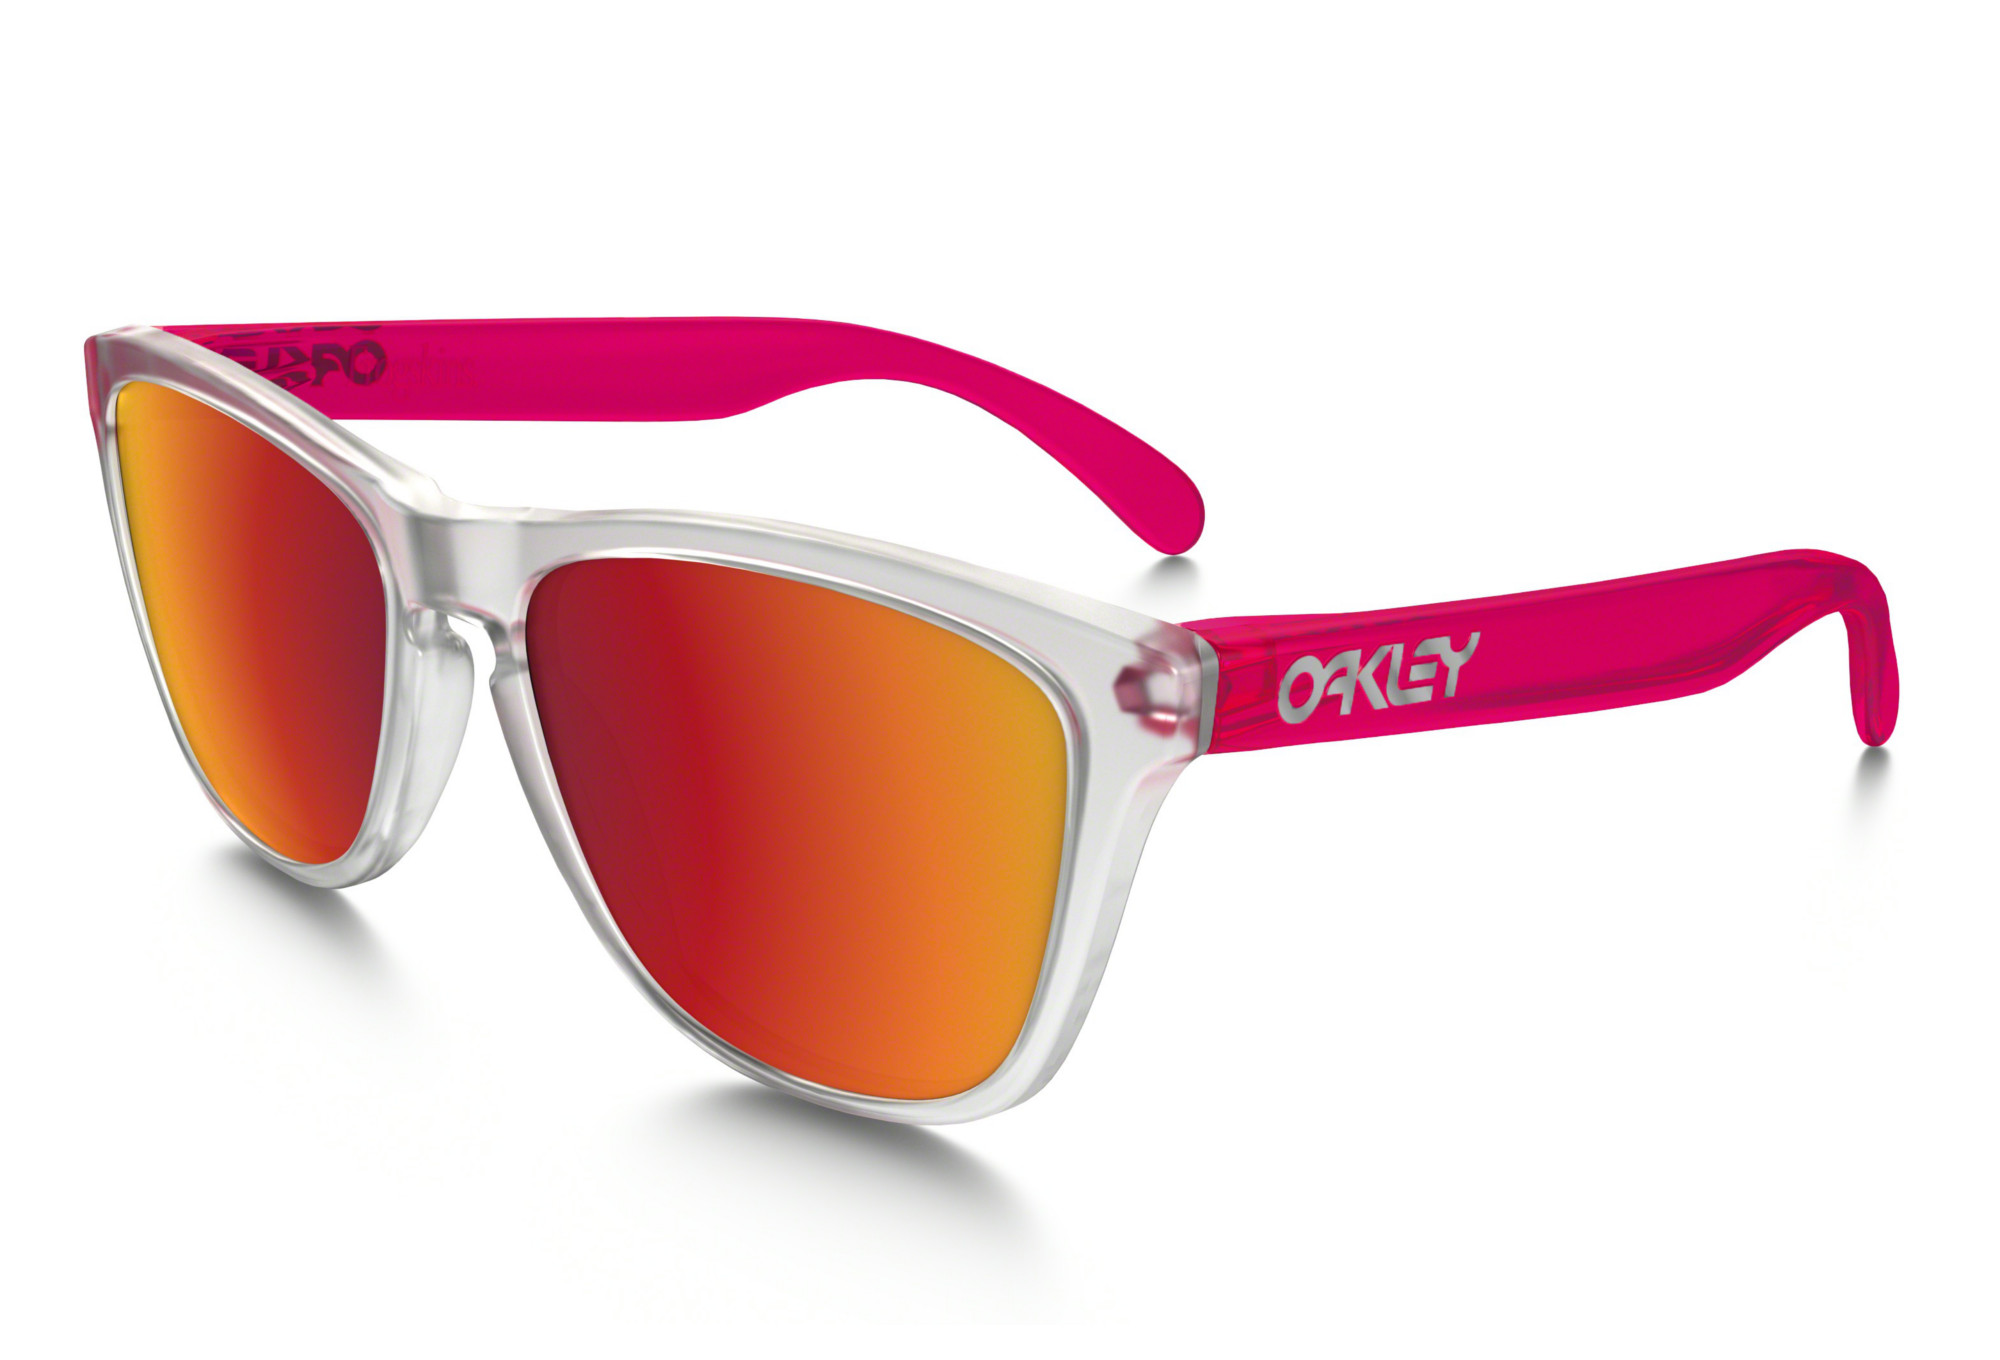 2a88fa12e2 OAKLEY Lunettes Frogskins Clear Pink/Torch Iridium Ref OO9013-B355 ...